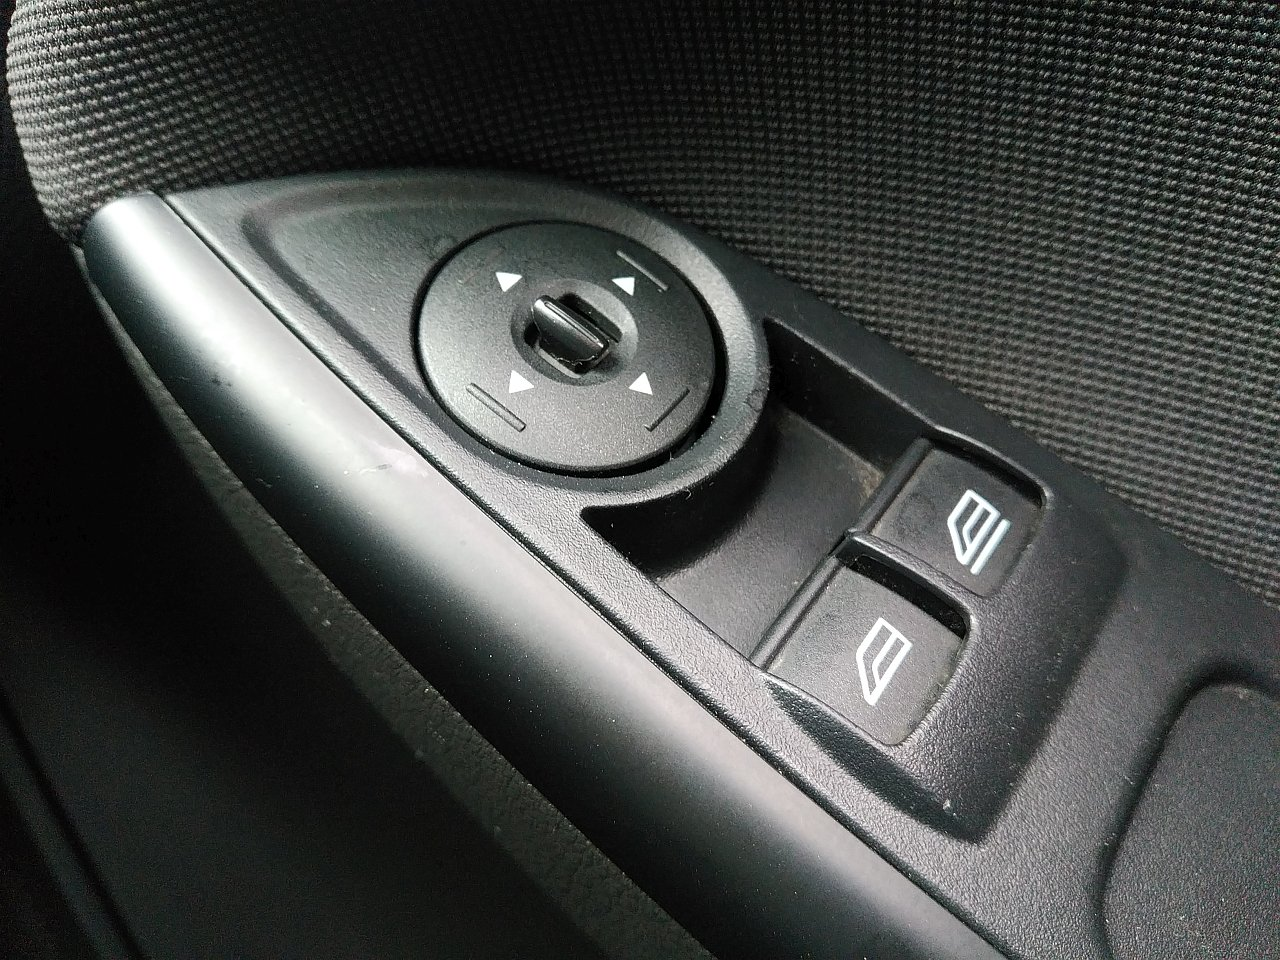 Ford Focus 2.0 TDCi 163 Zetec S 5dr Powershift image 19